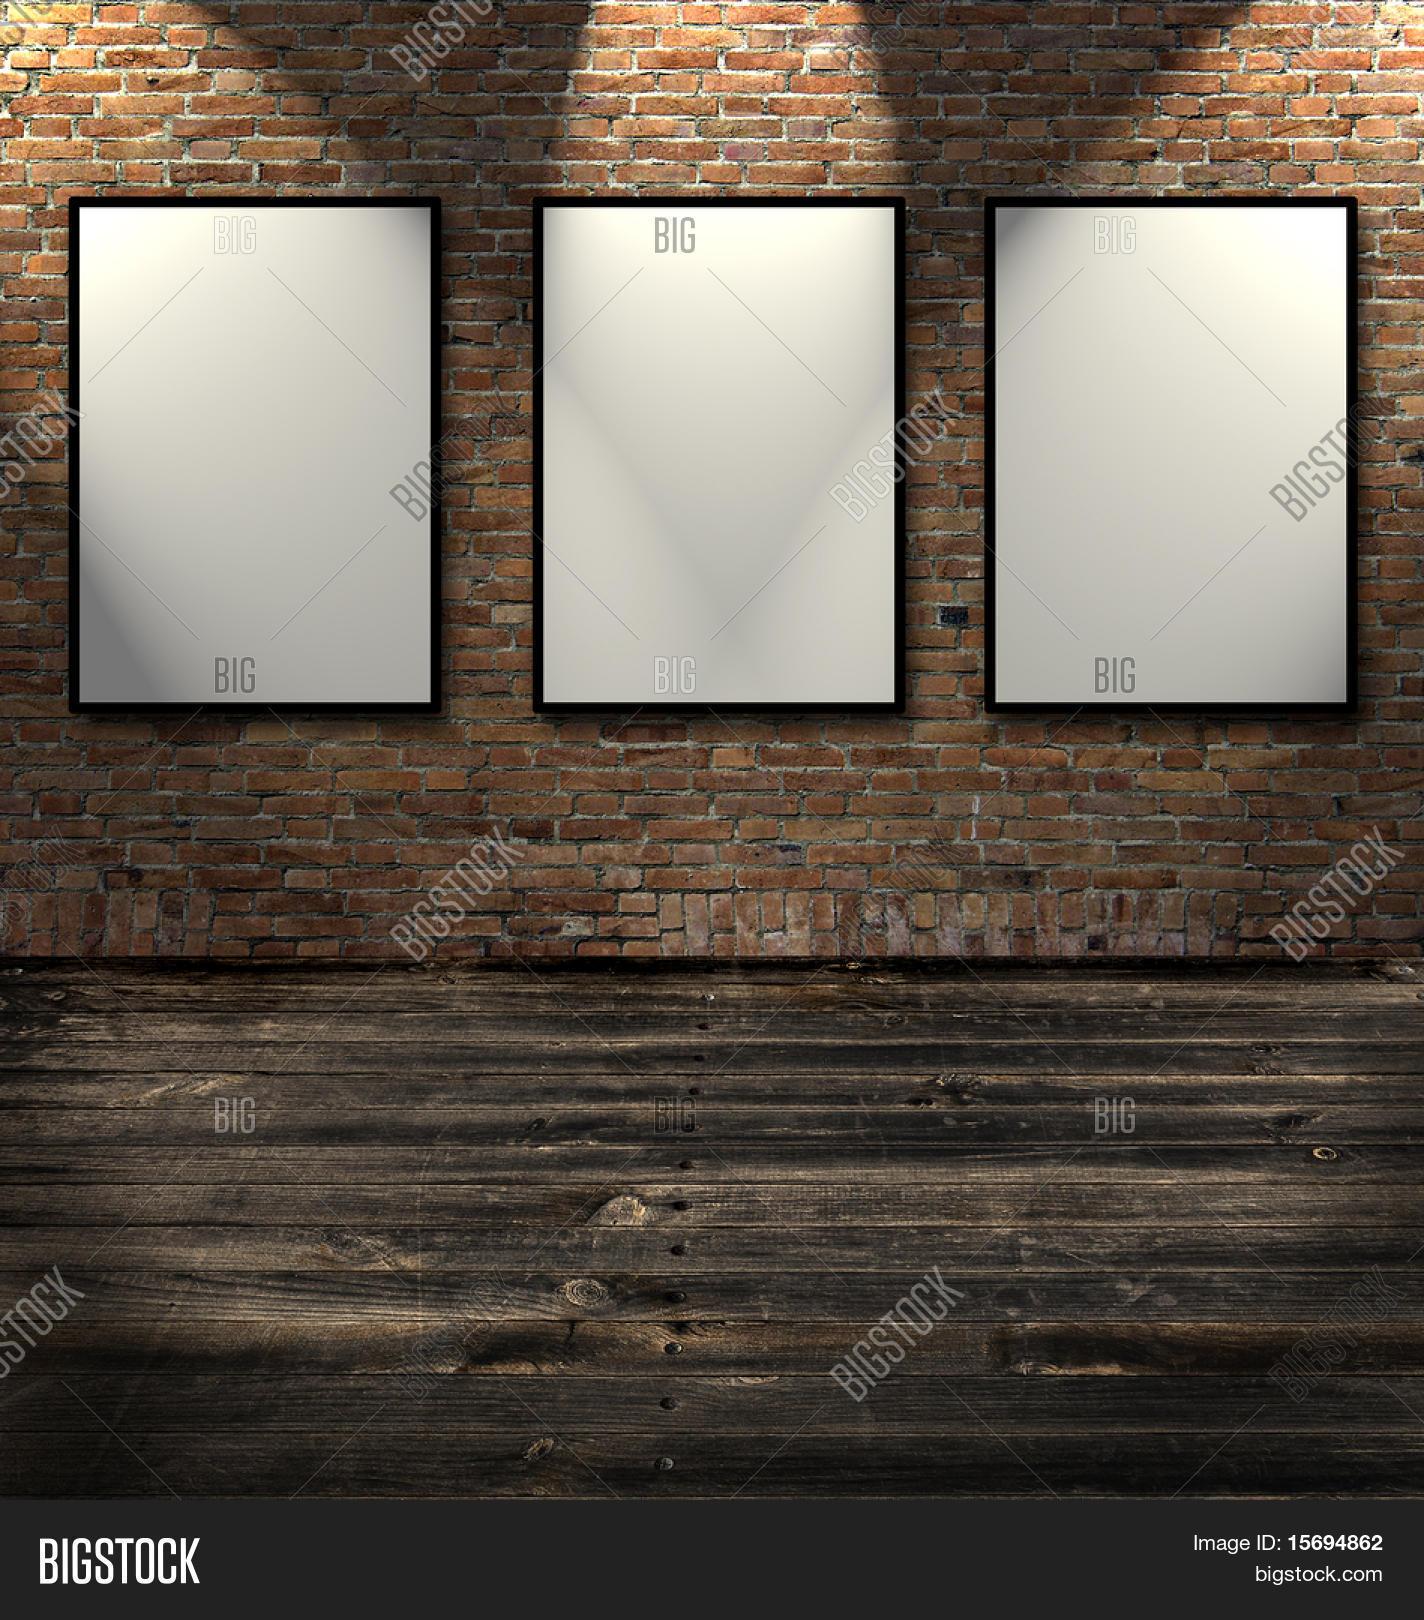 Three Empty Frames Image & Photo (Free Trial) | Bigstock